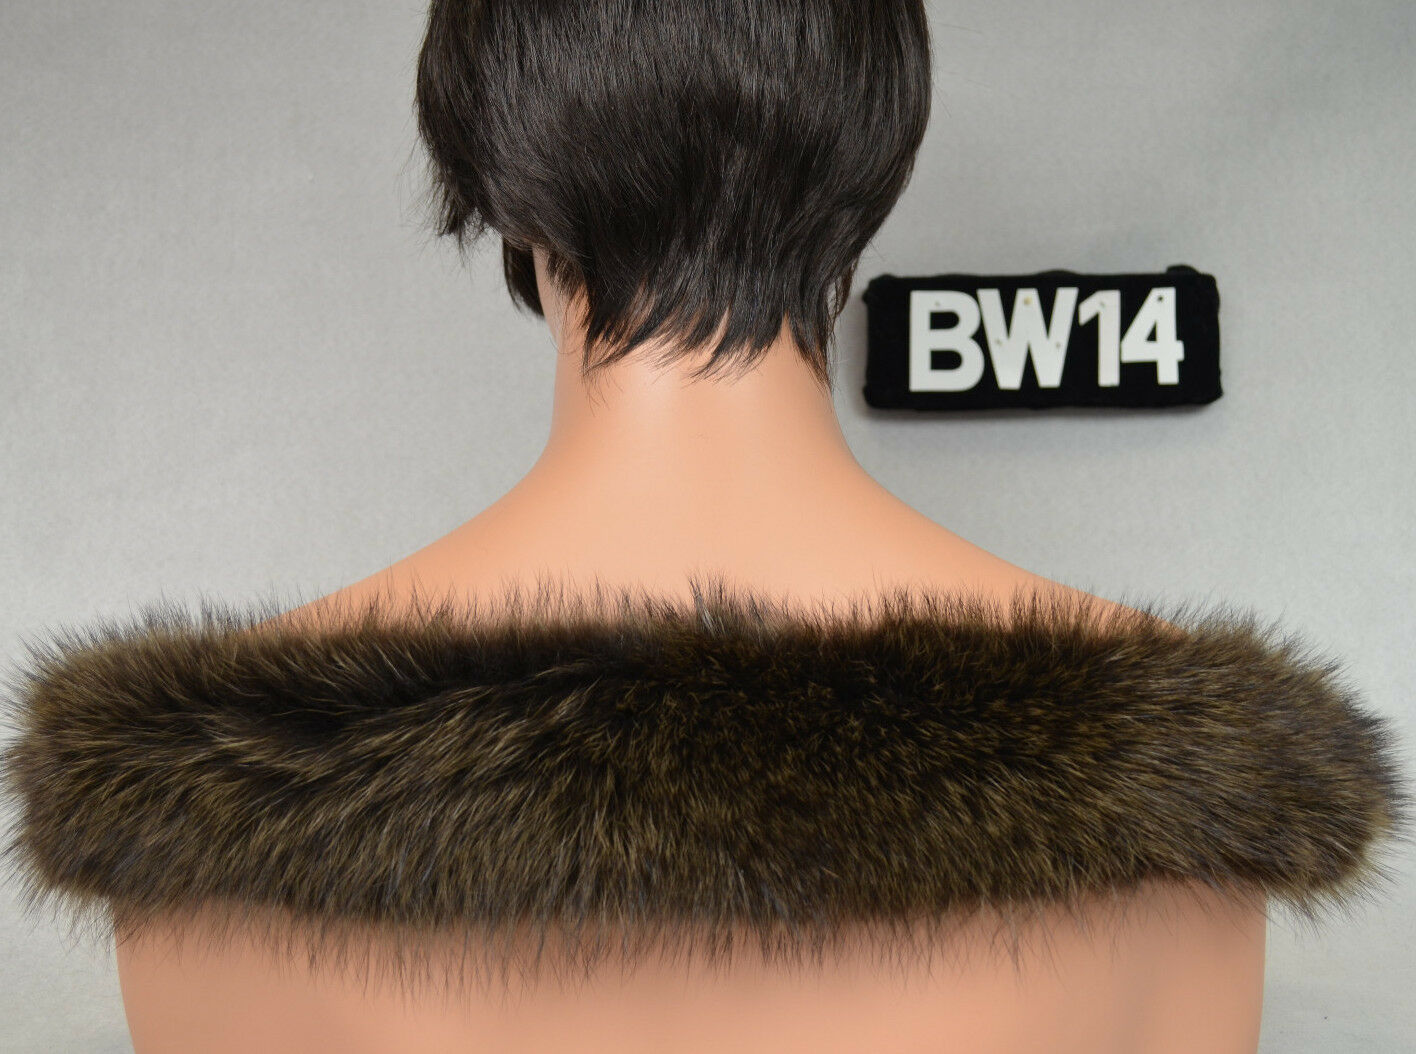 Kapuzenstreifen 55cm Pelz Fell Kapuze Schal Neu Waschbär BW14 BW14 BW14 | Neuer Stil  | Sale Düsseldorf  65260e